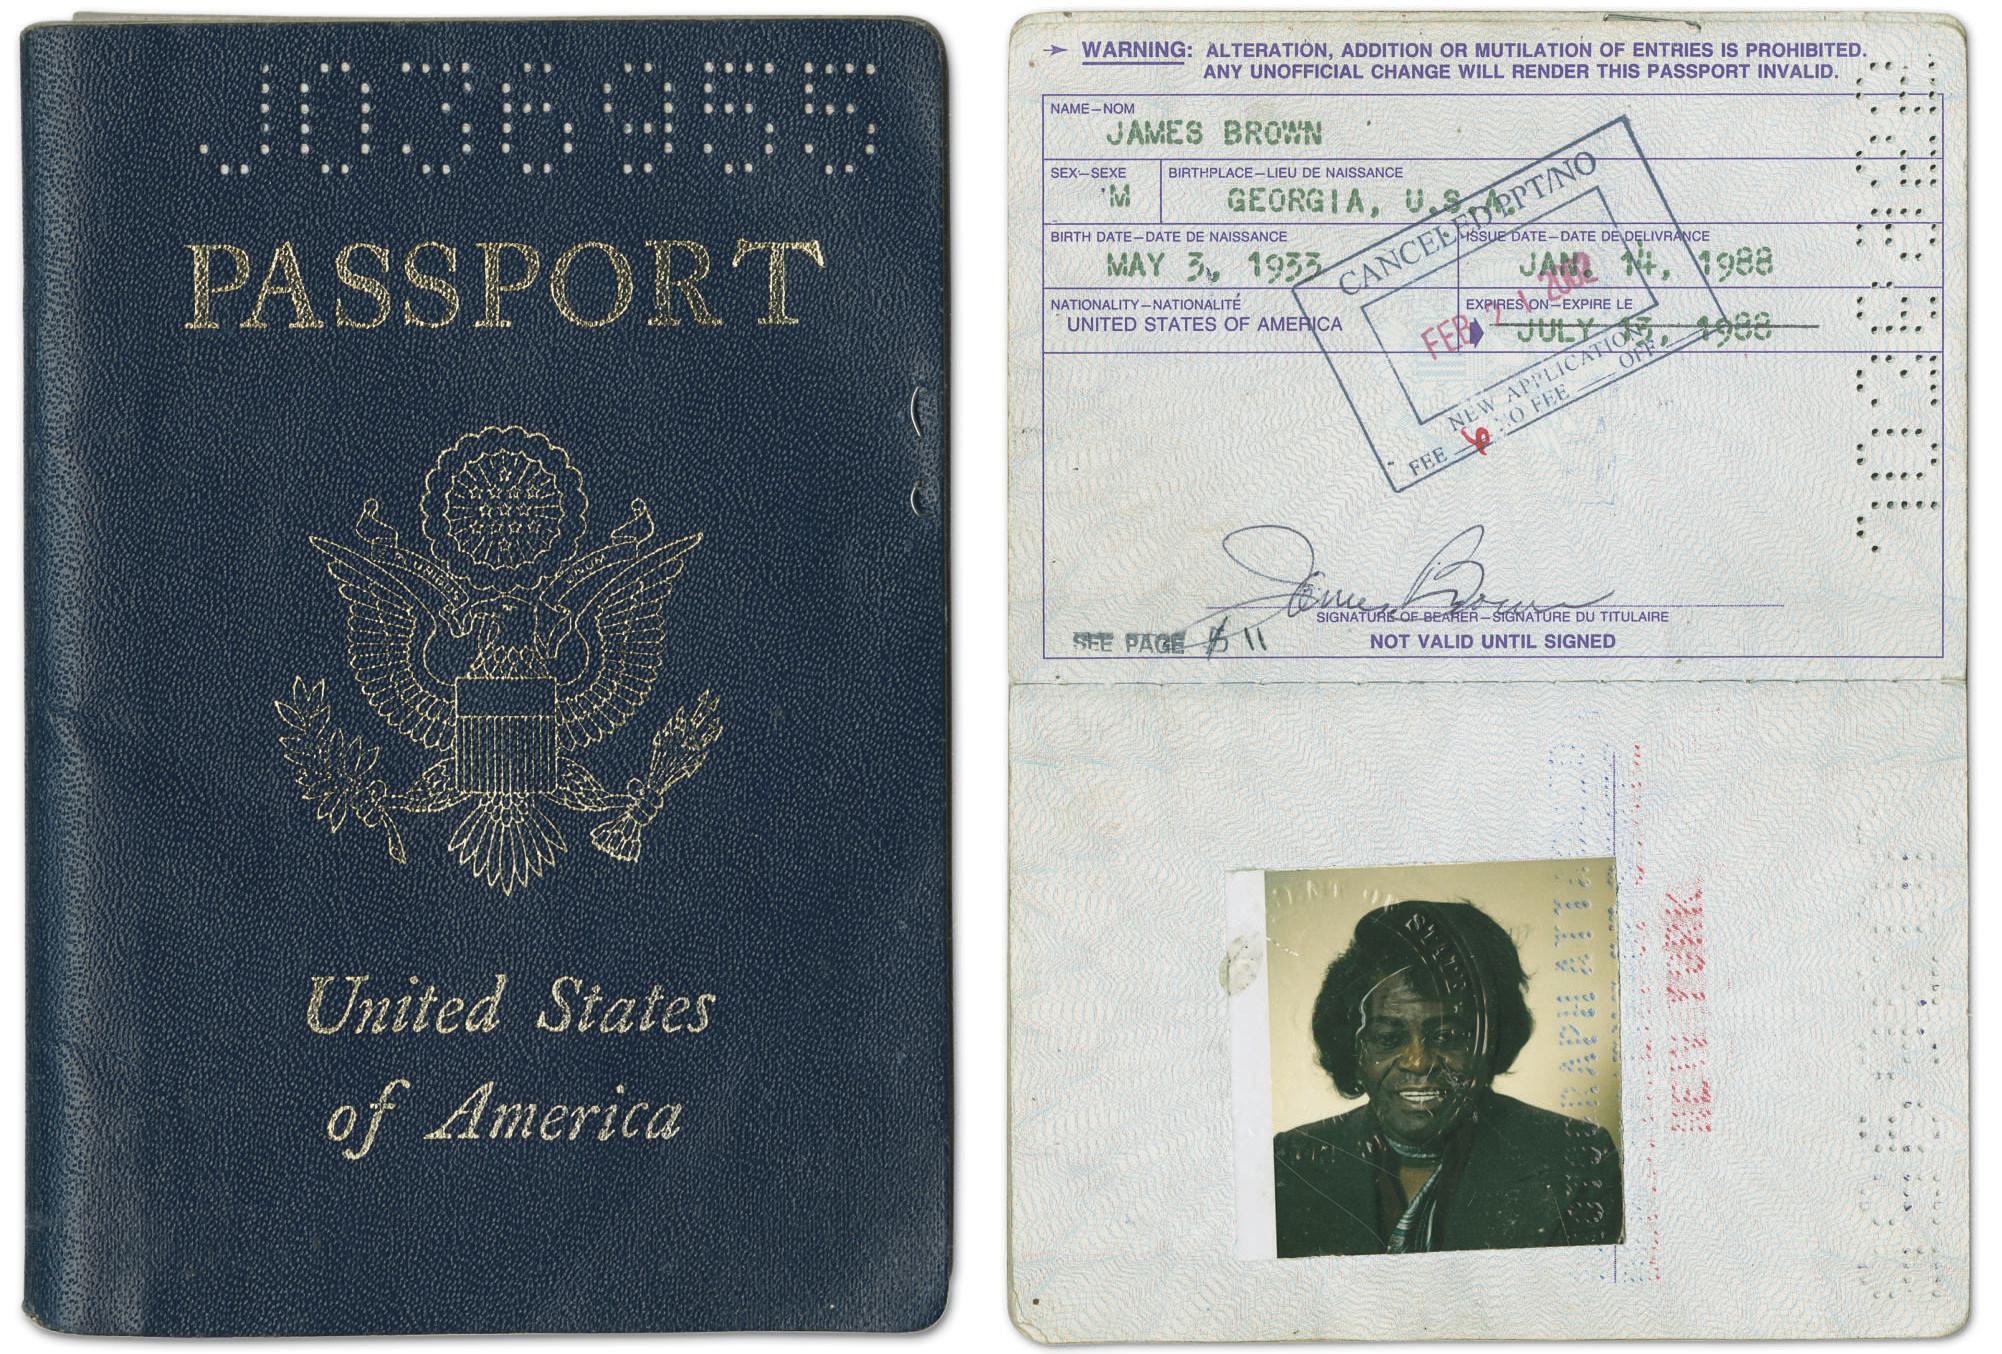 James Brown Passport